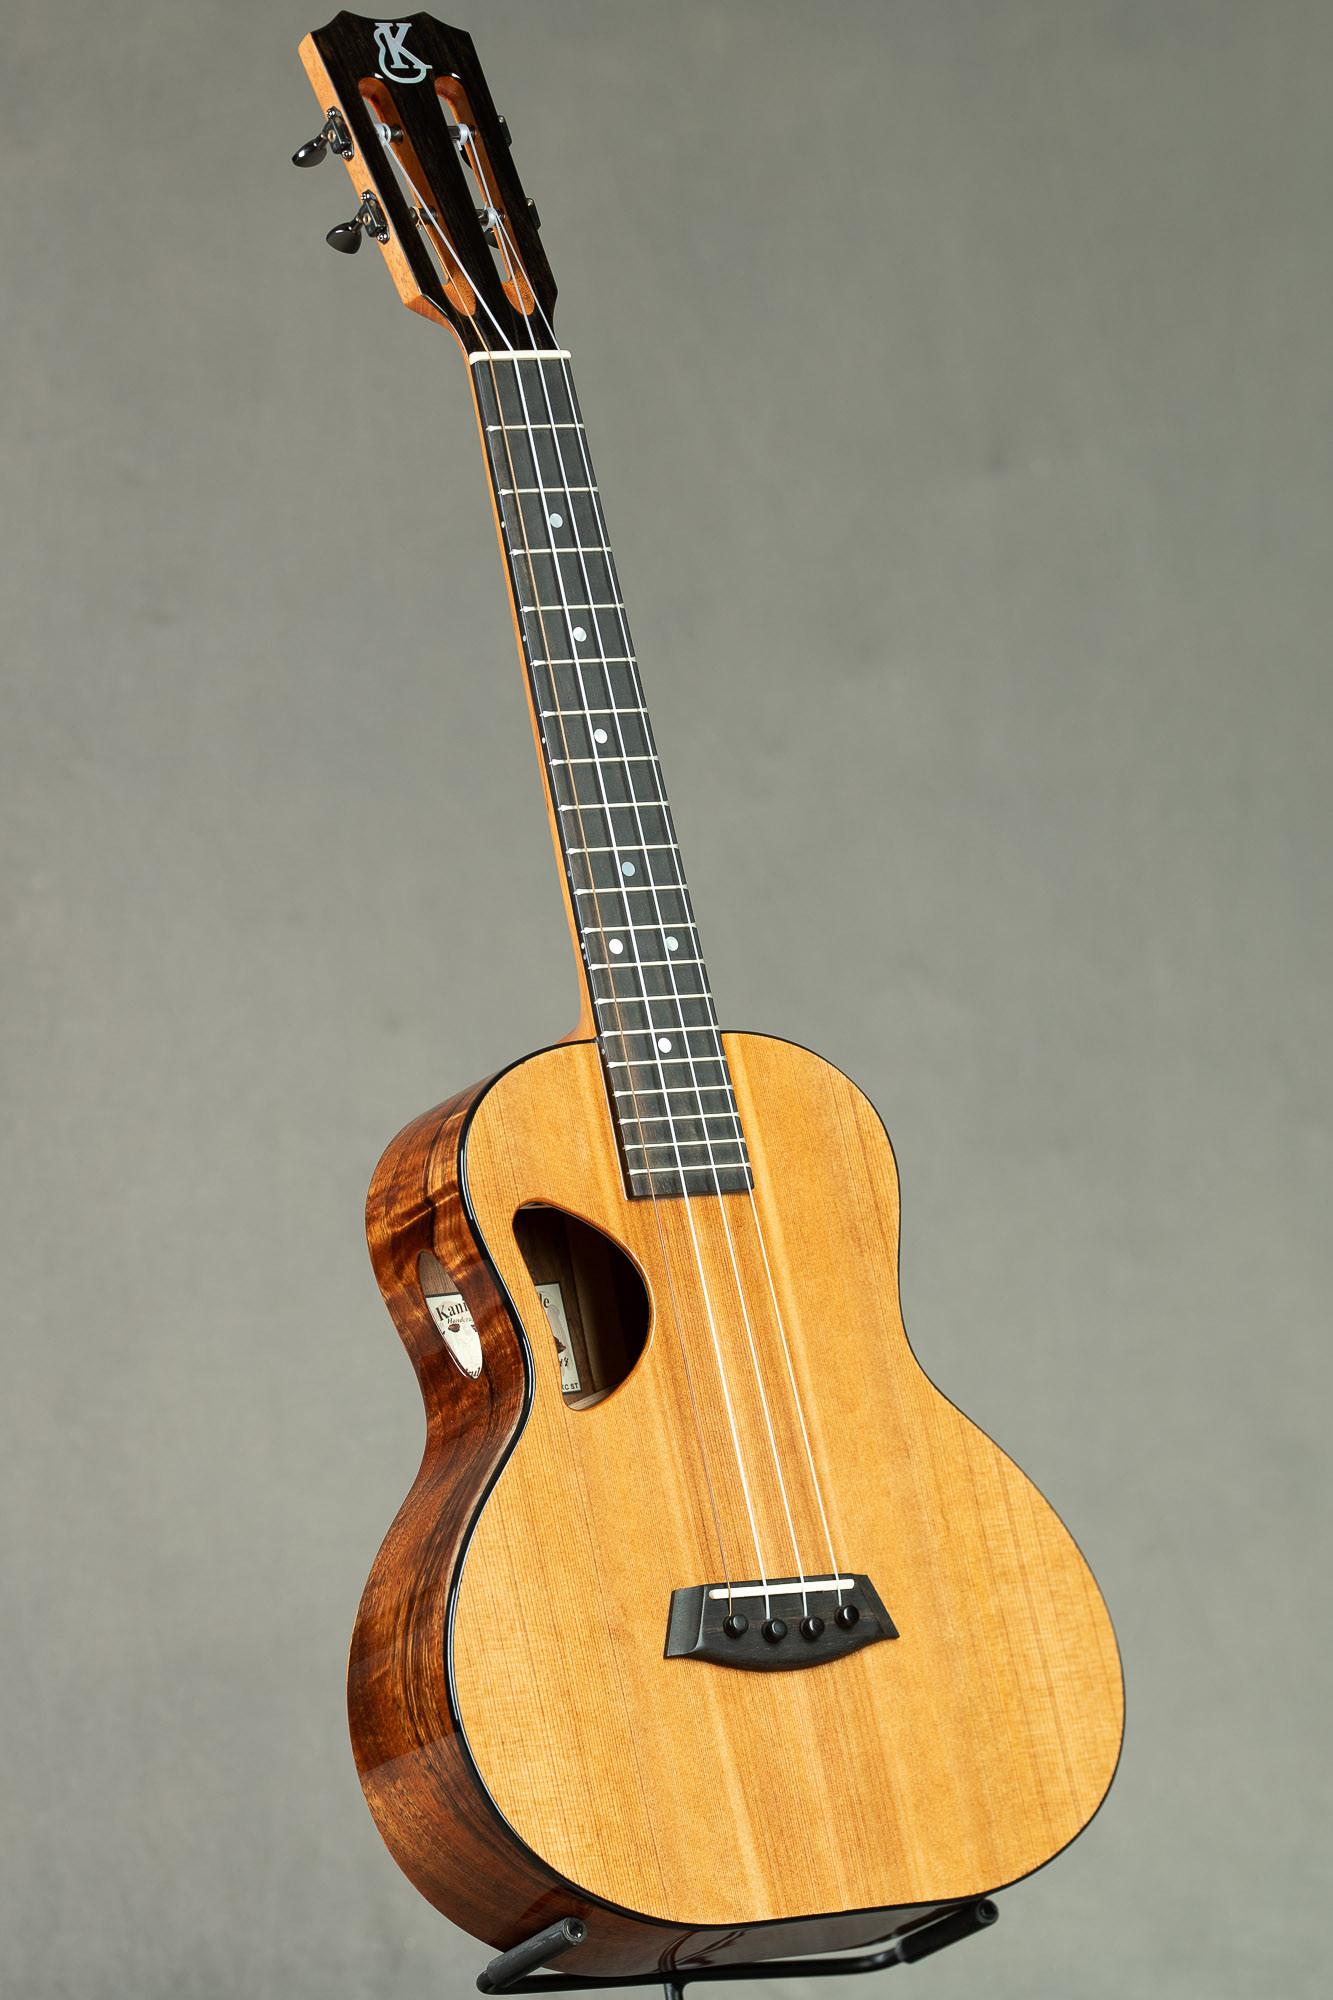 Kanile'a DK Koa Cedar Super Tenor (DKST-C 22394)